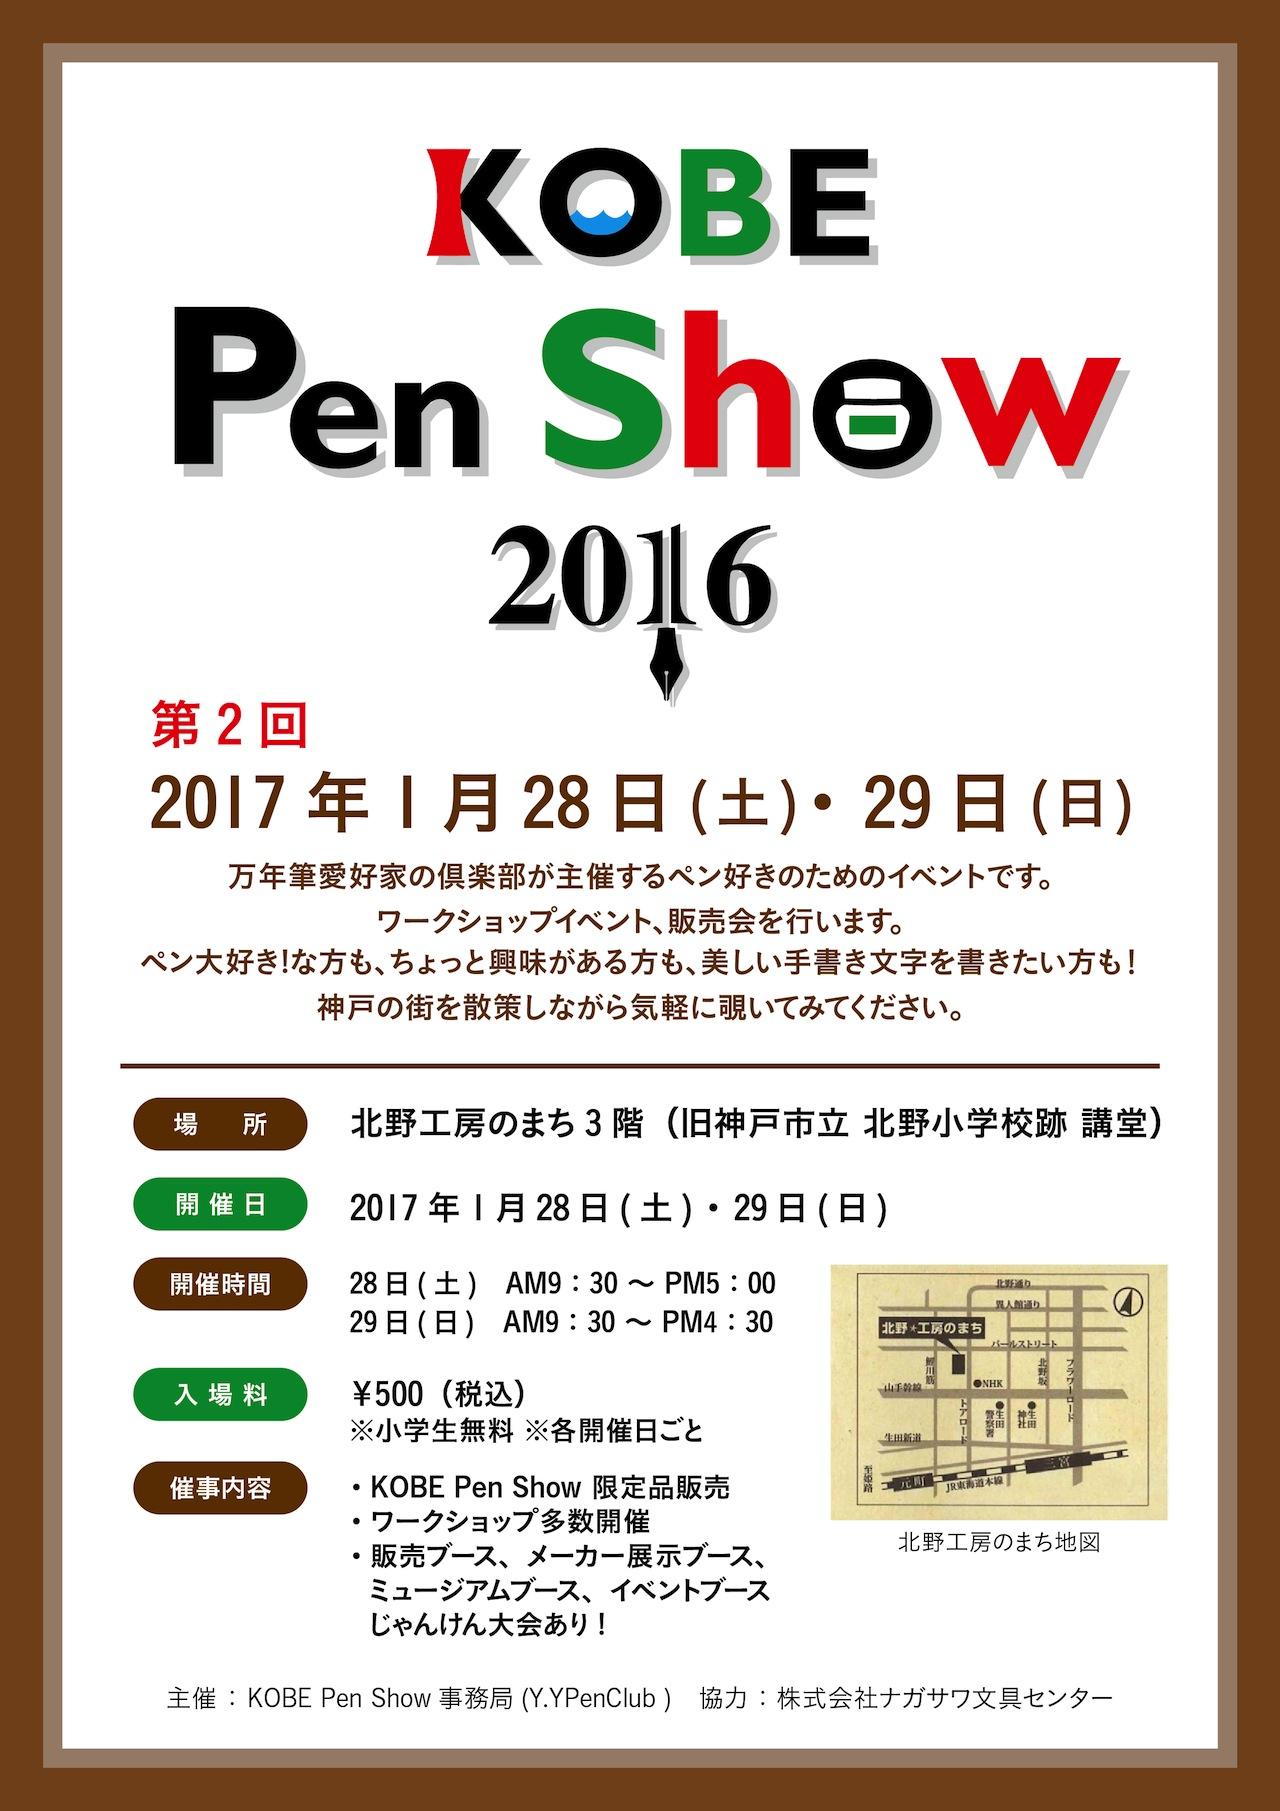 第2回KOBE Pen Show 2016 @北野工房のまち3階(旧神戸市立 北野小学校跡 講堂)